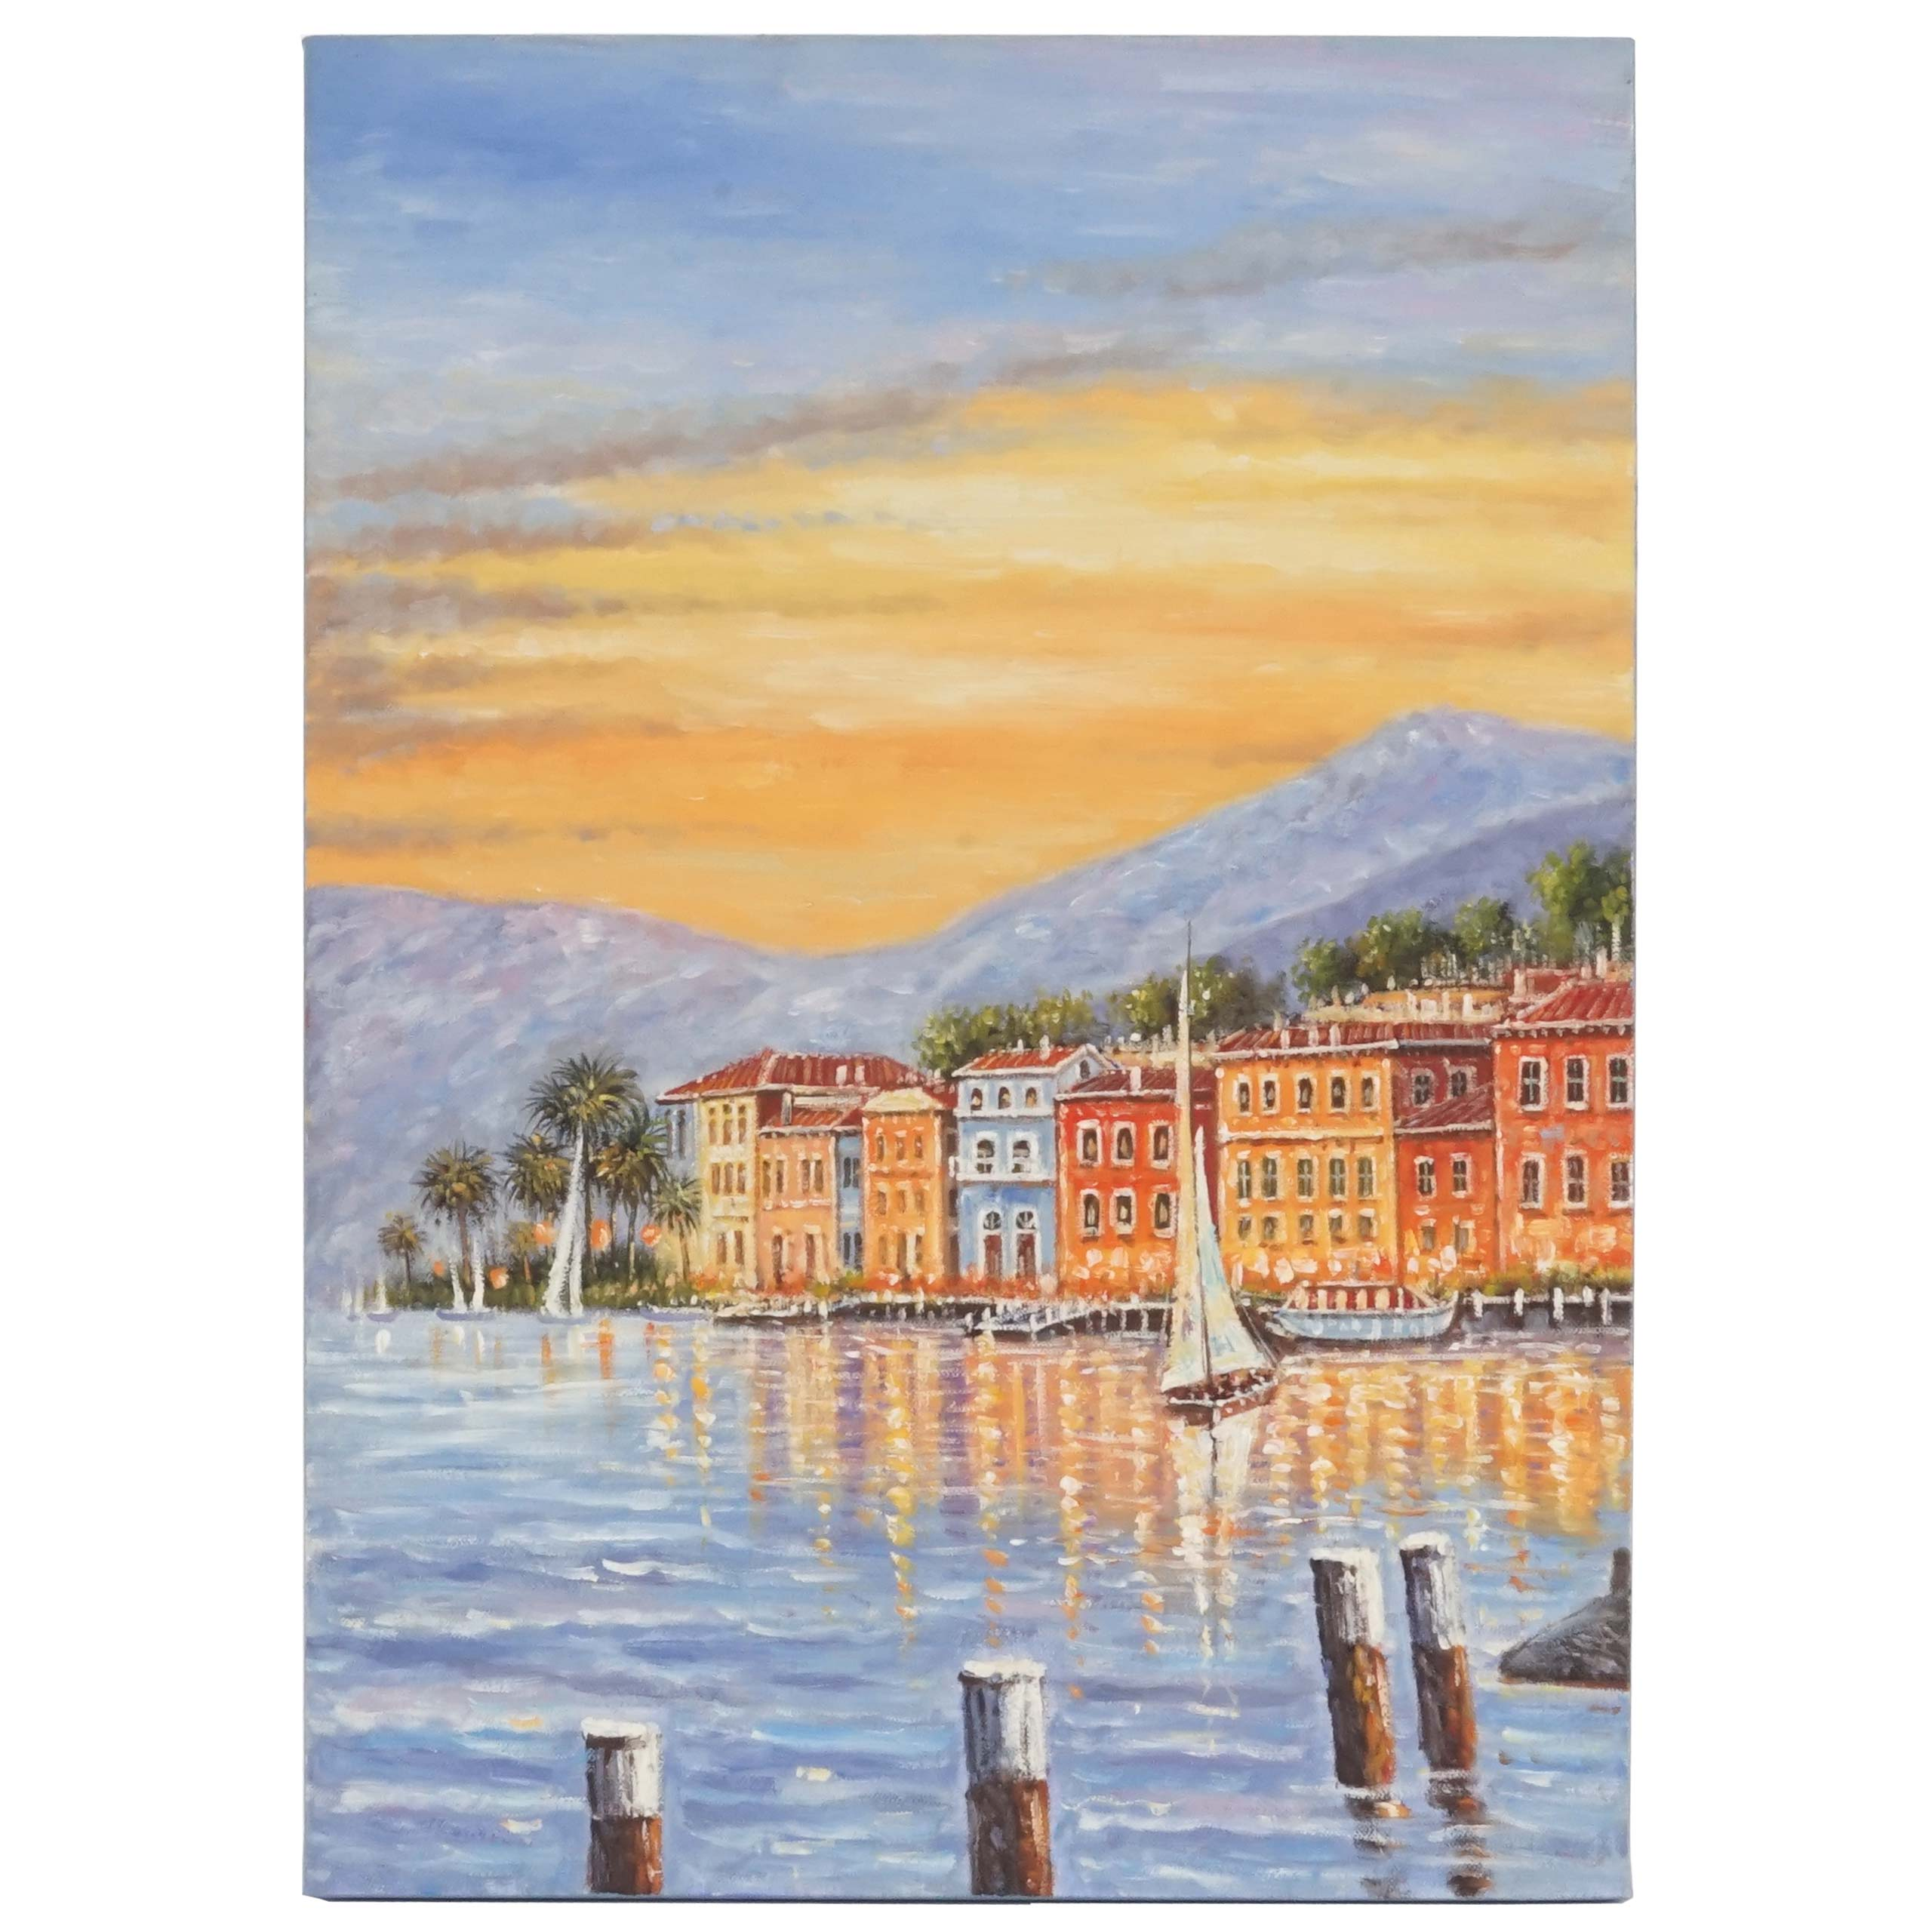 Mendler Ölgemälde Küste, 100% handgemaltes Wandbild Gemälde XL, 70x50cm ~ Variantenangebot 44747